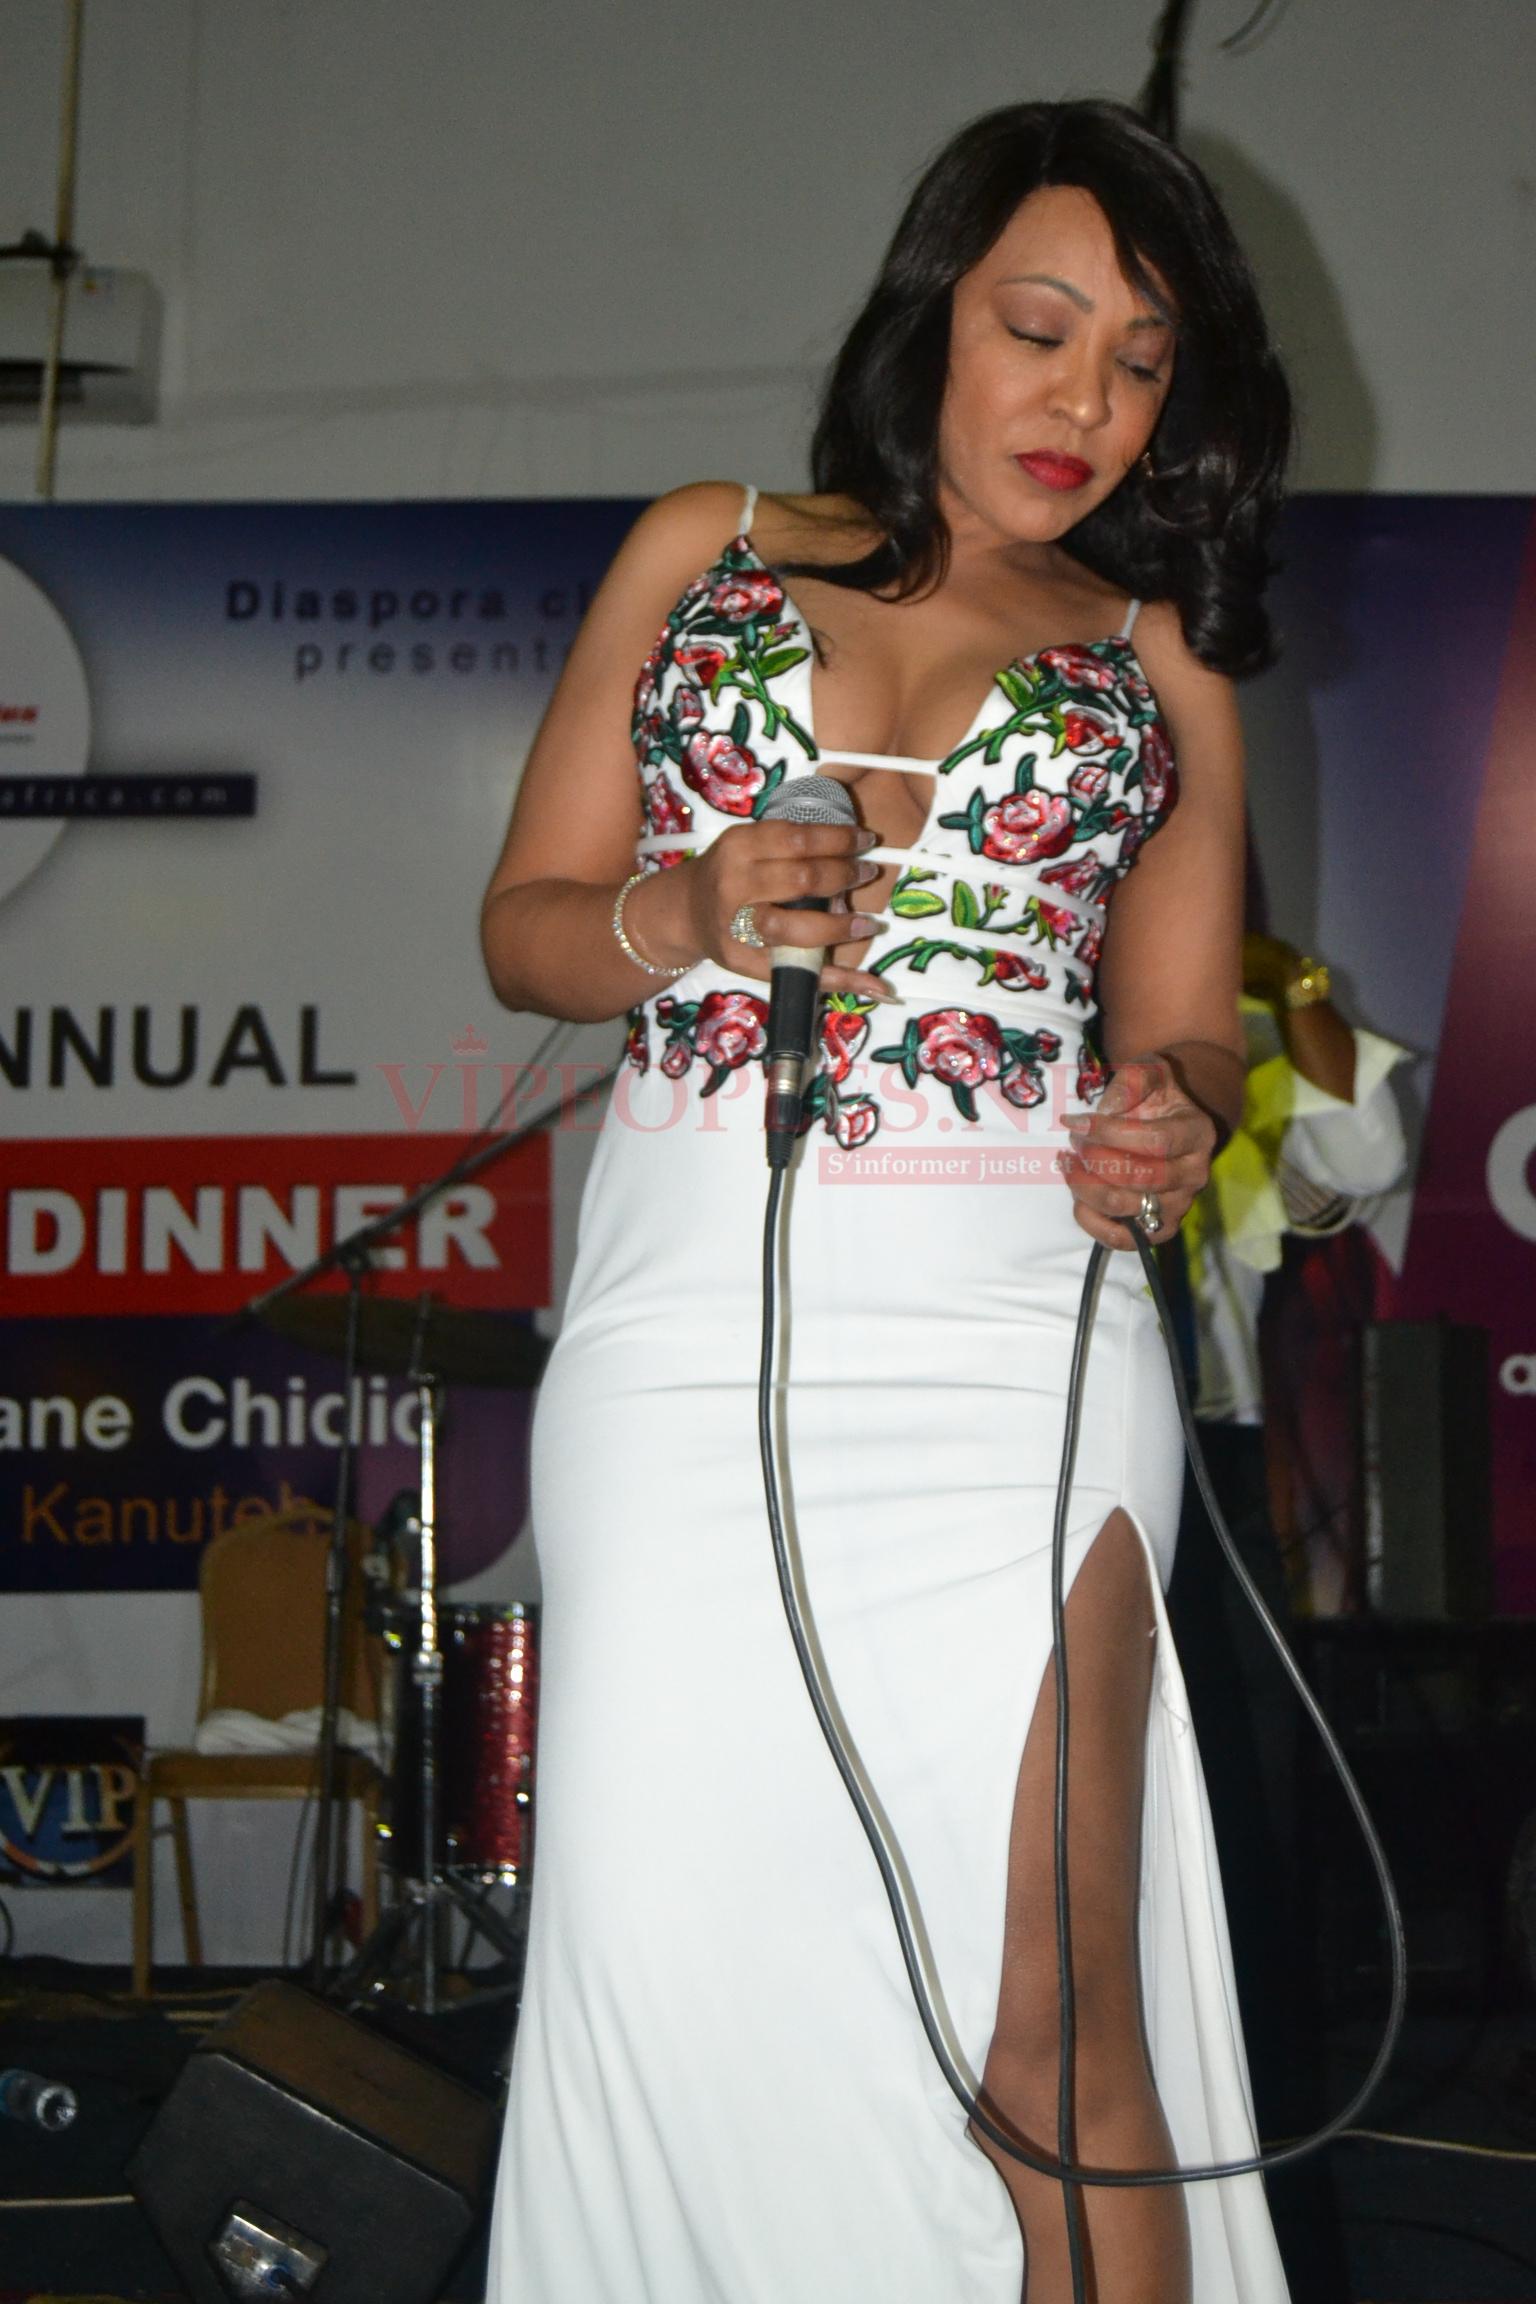 VIDÉO 1ER JANVIER: Viviane dans une robe ultra sexy met le feu en Gambie. REGARDEZ